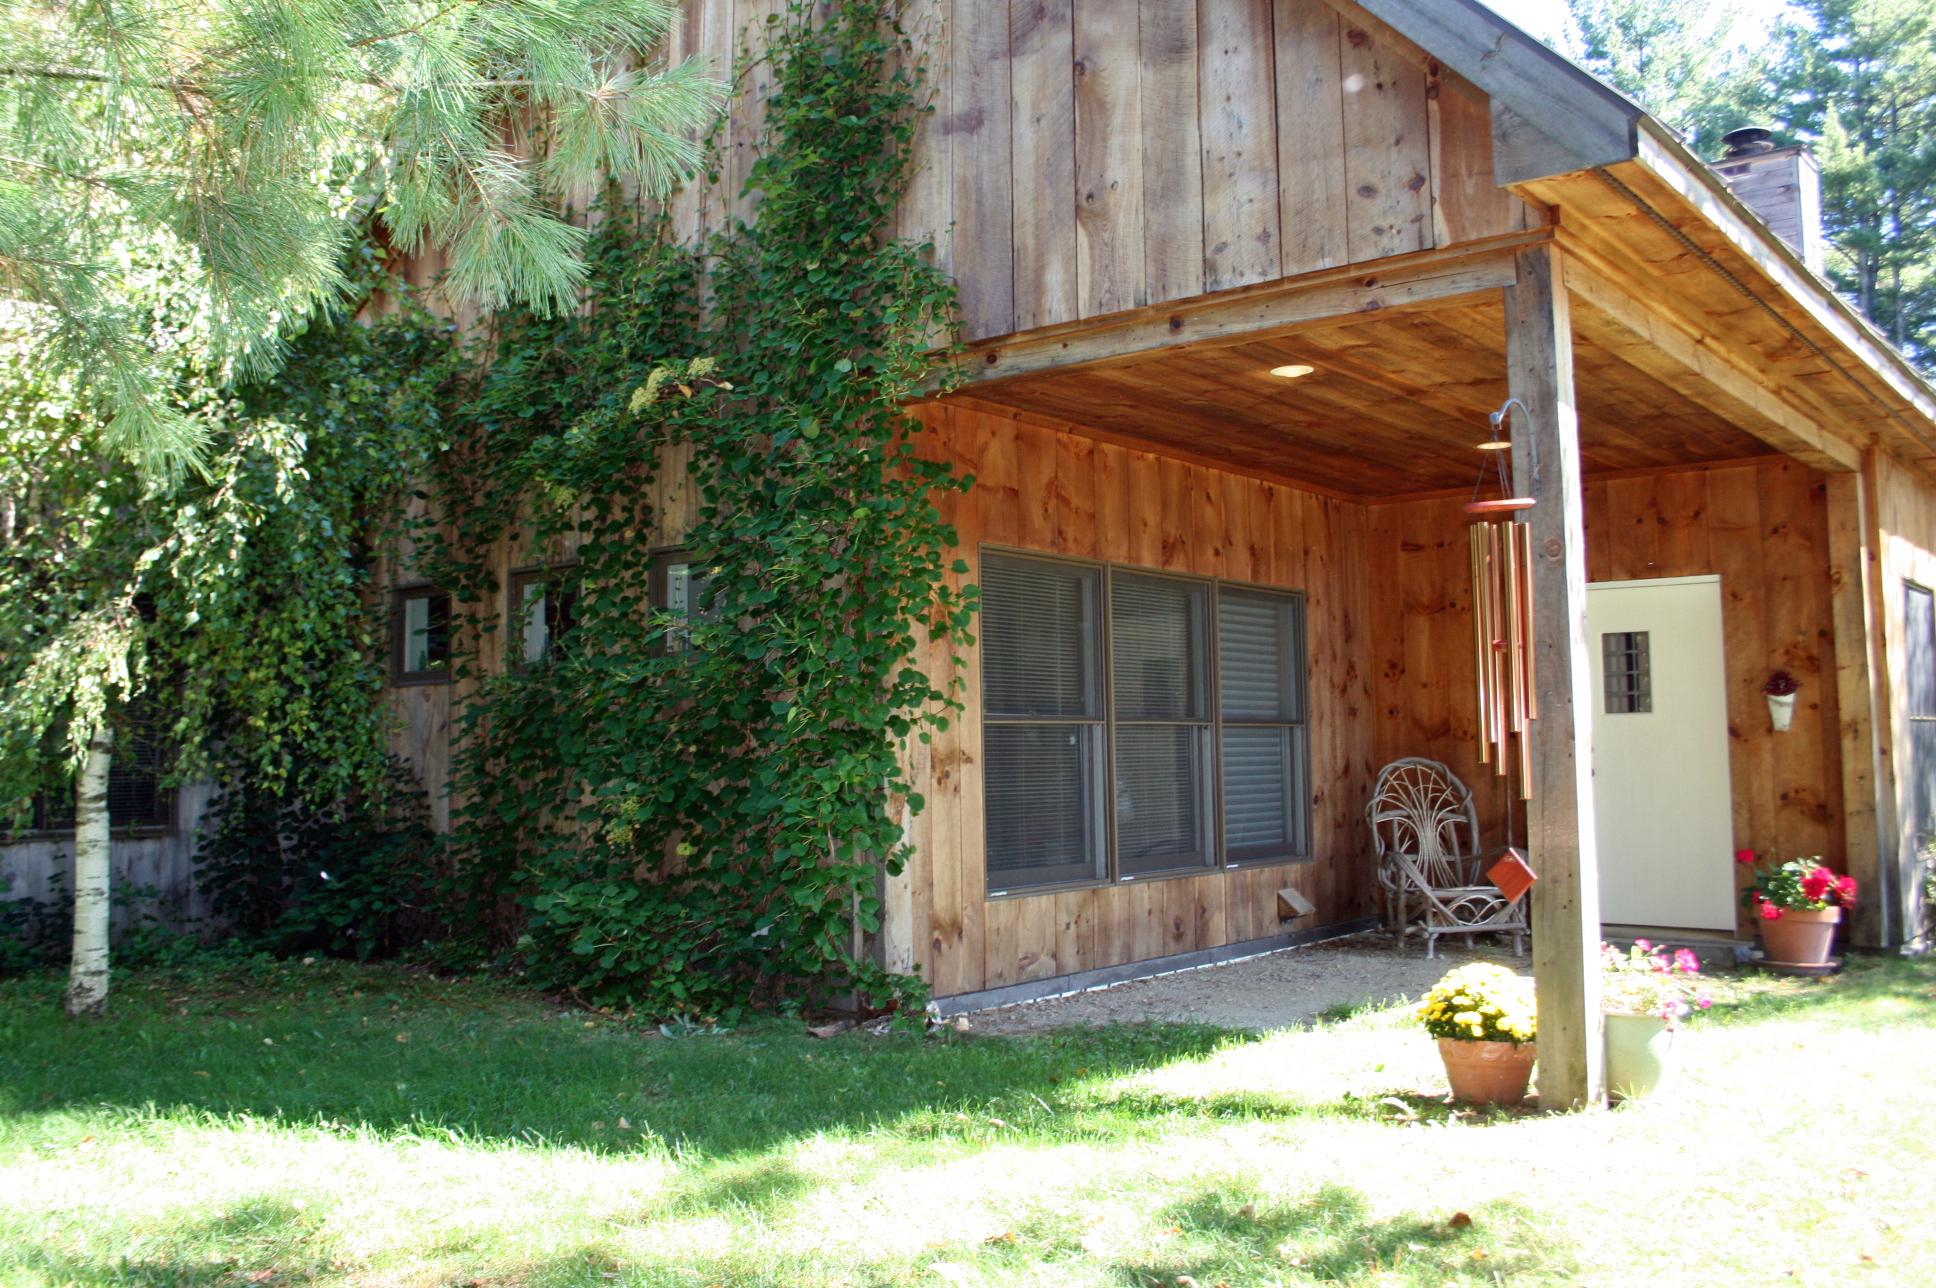 Villa per Vendita alle ore 1718 Belgo Road, Castleton 1718 Belgo Rd Castleton, Vermont, 05735 Stati Uniti